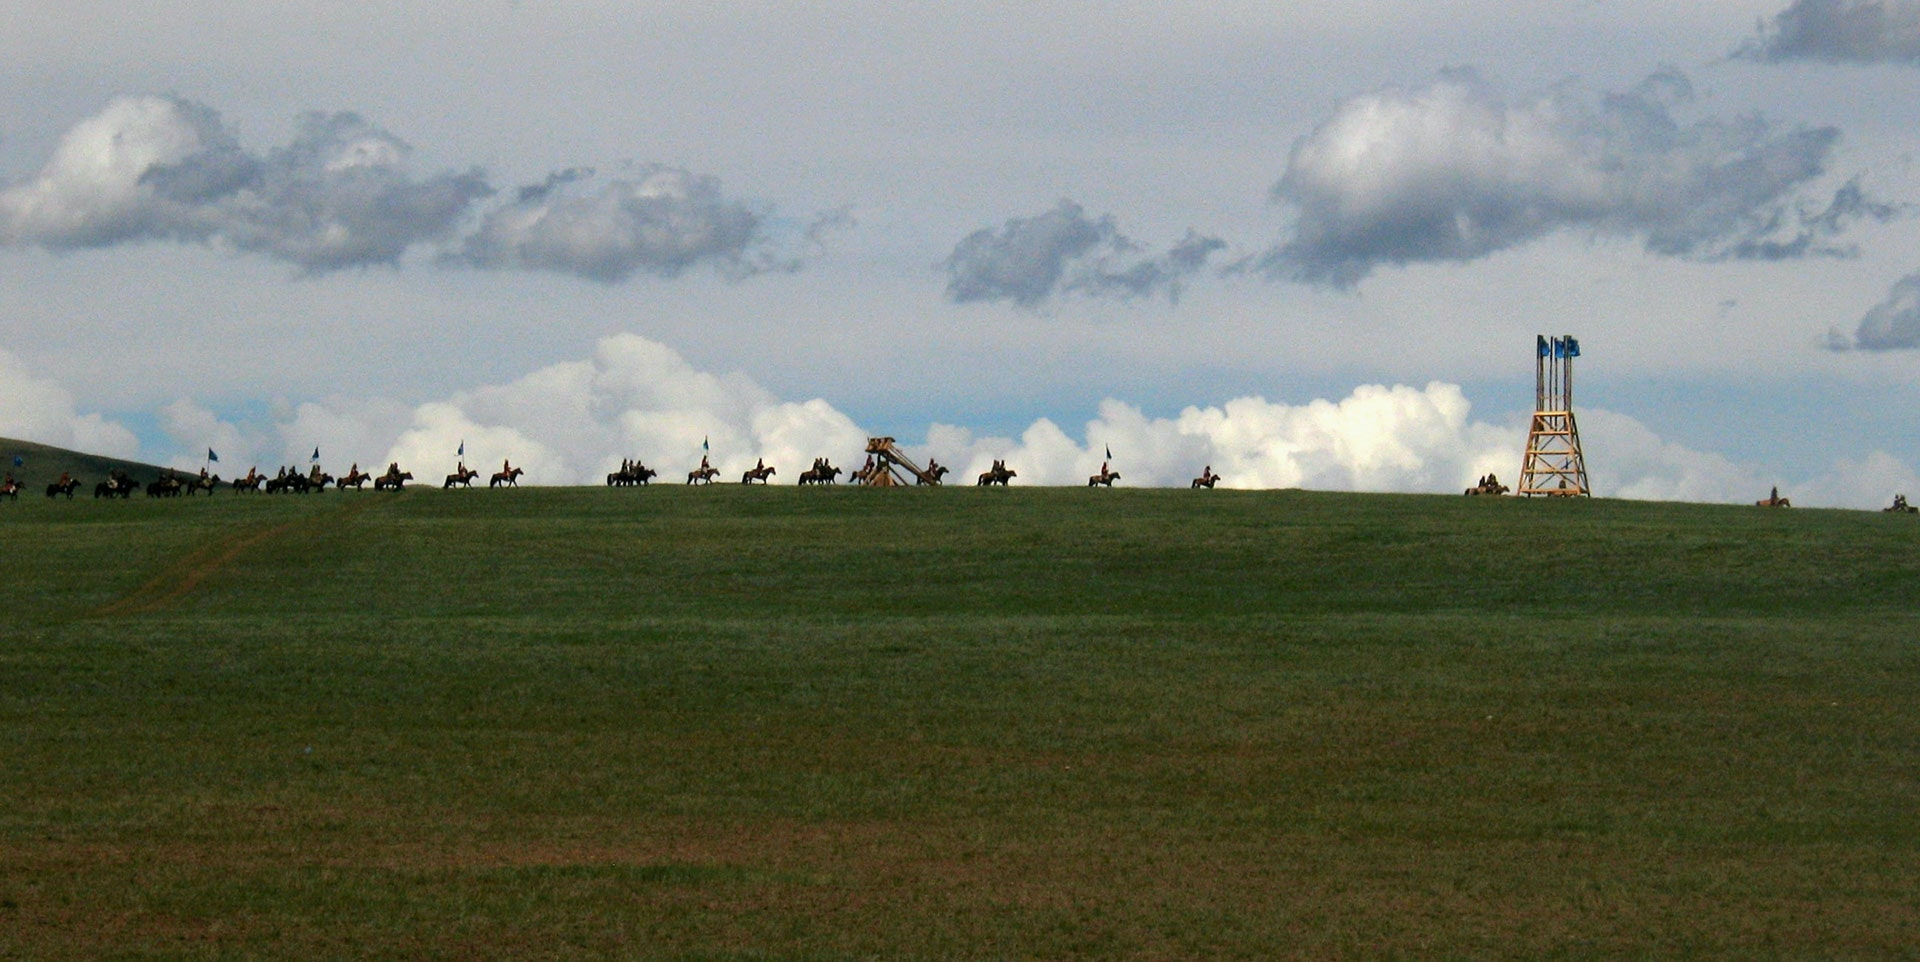 Reenactment of a Mongol military movement